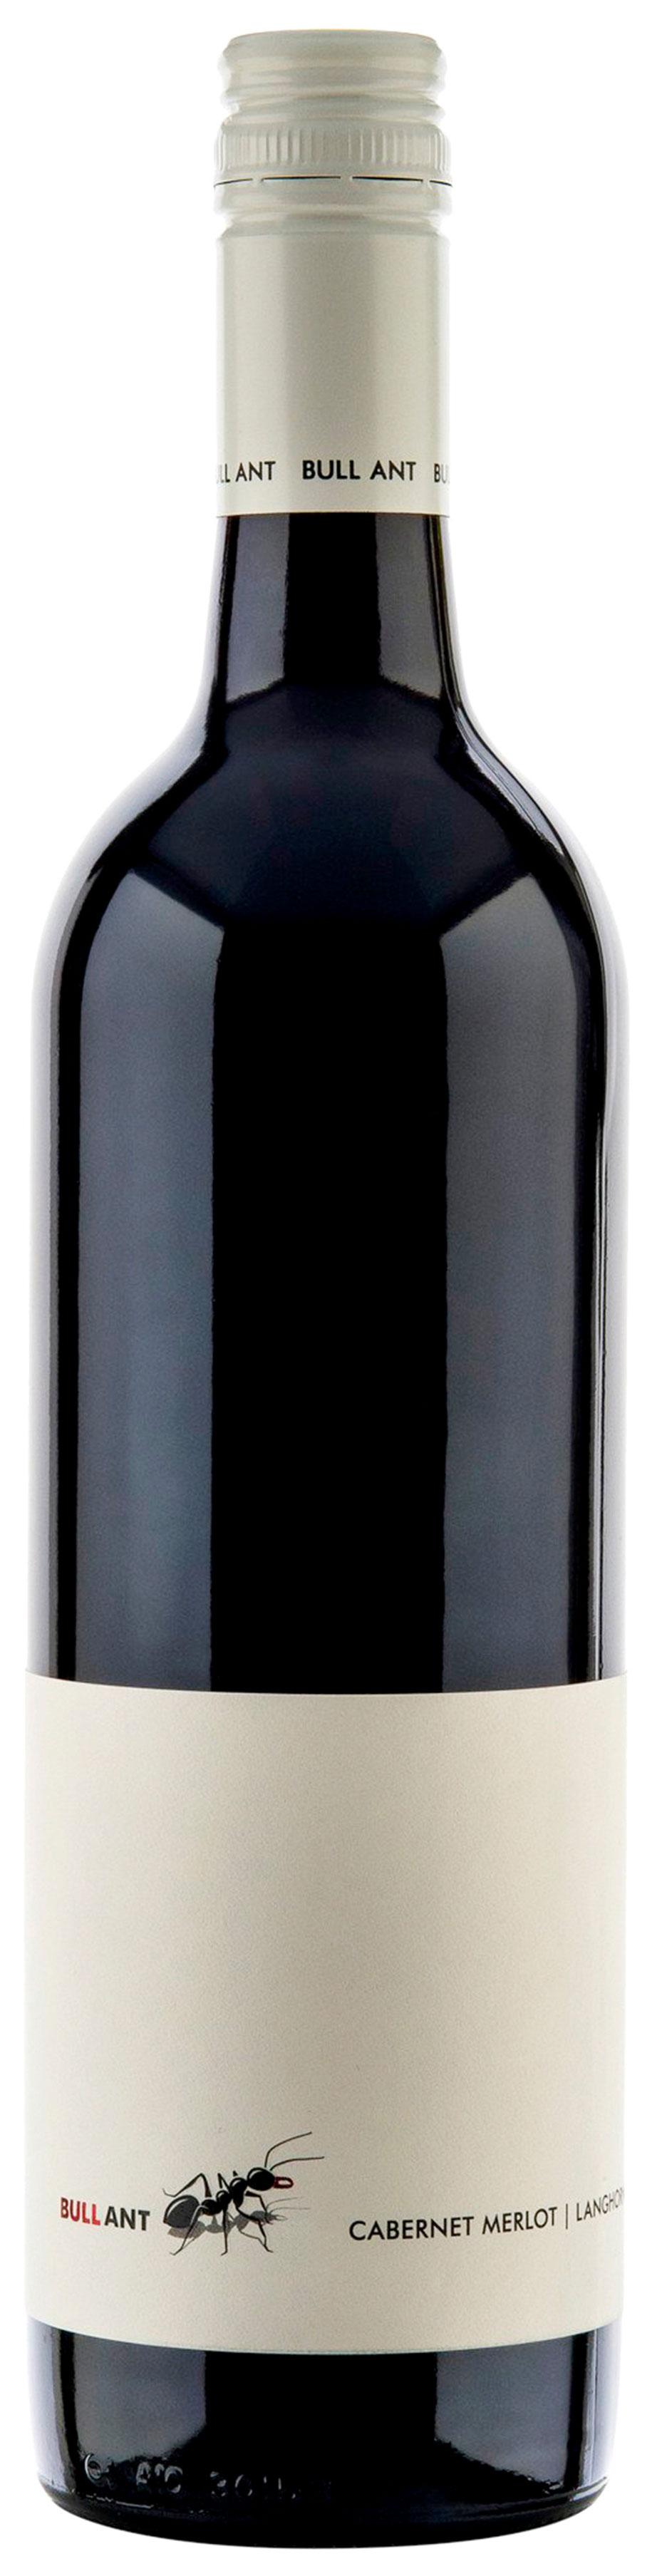 https://vinocorpperu.com/images/vinos/lakebreeze/bullant_cabernet_merlot_2016.jpg